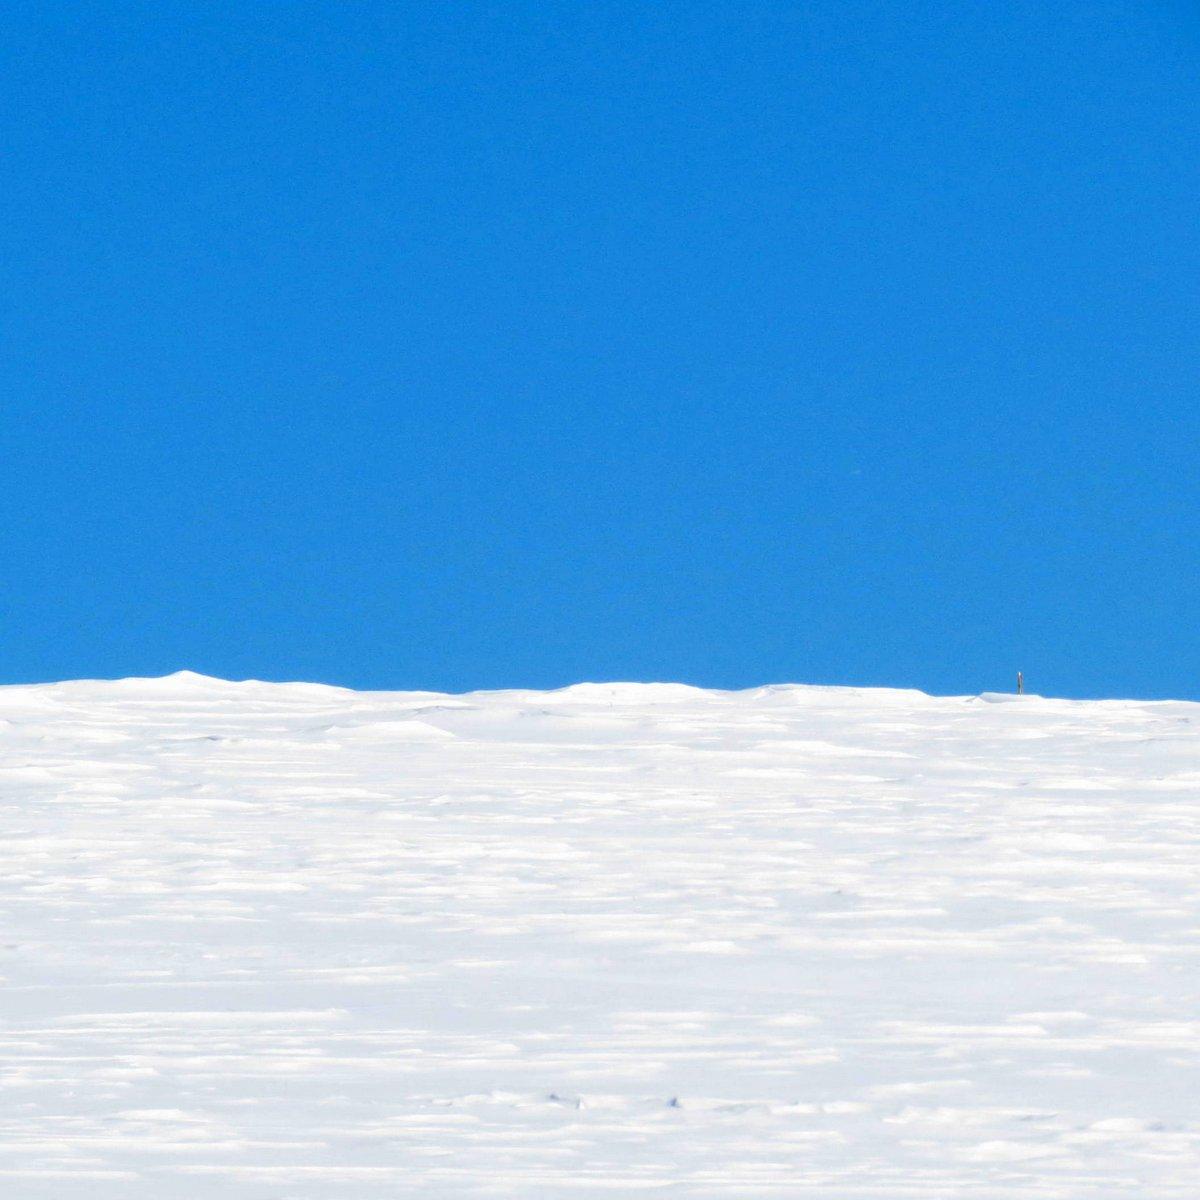 8. Snow and Sky